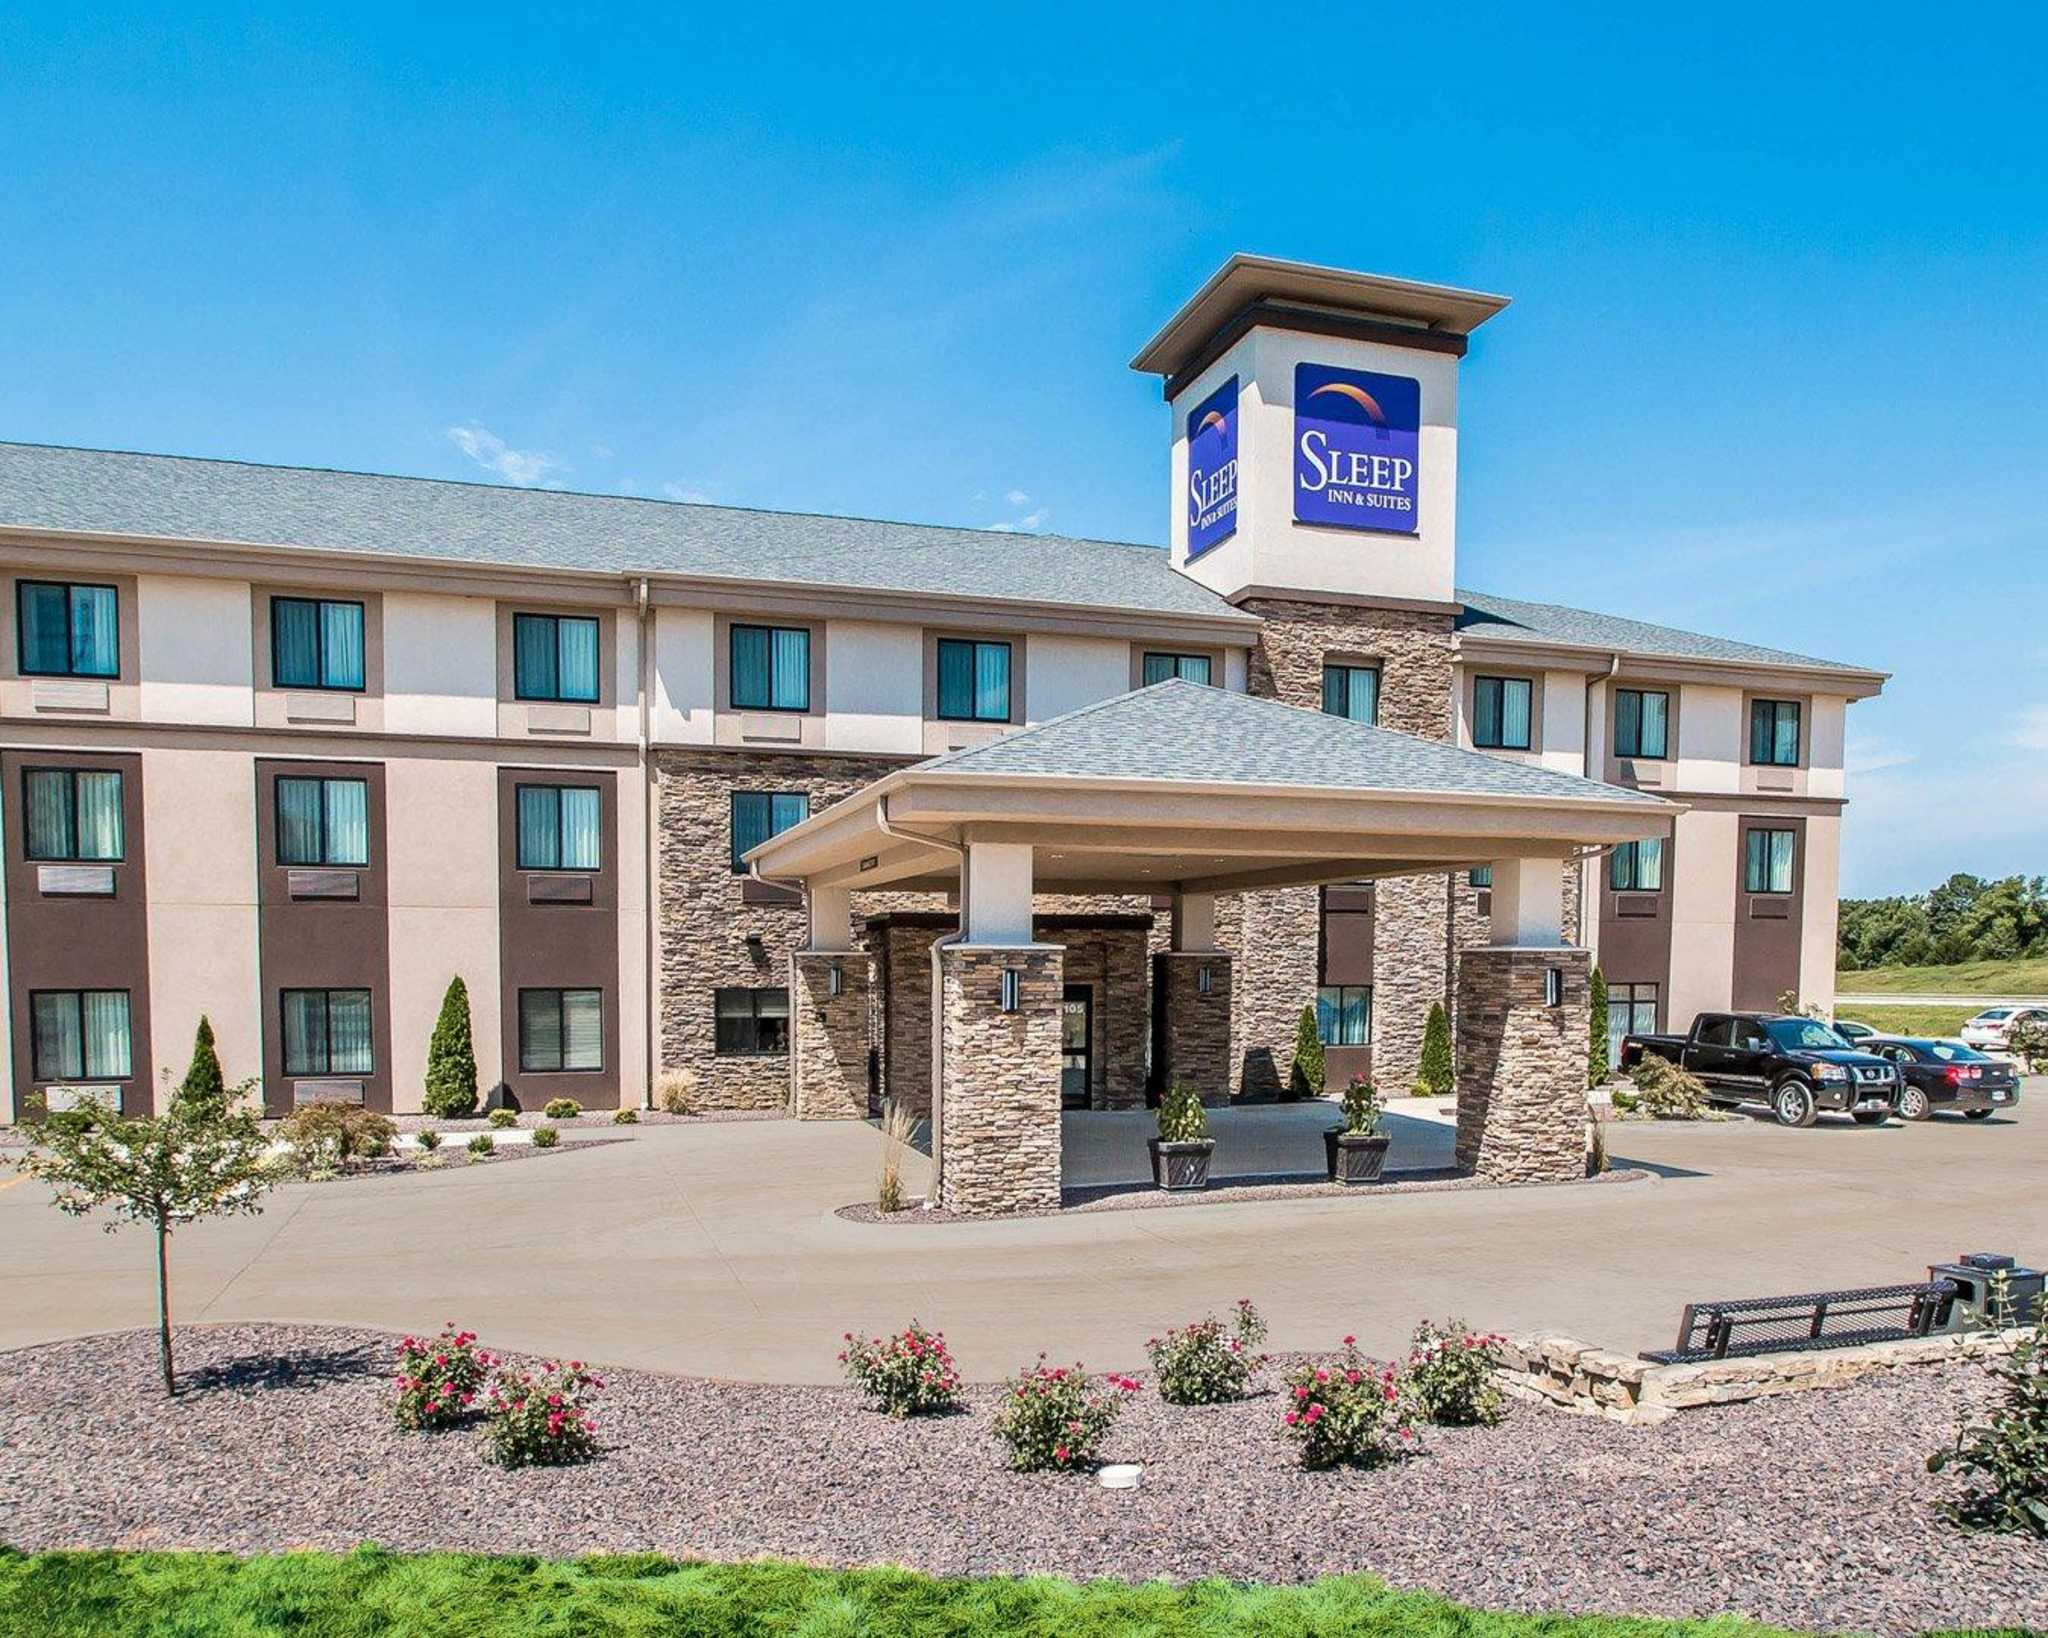 Hannibal Mo Hotels And Motels